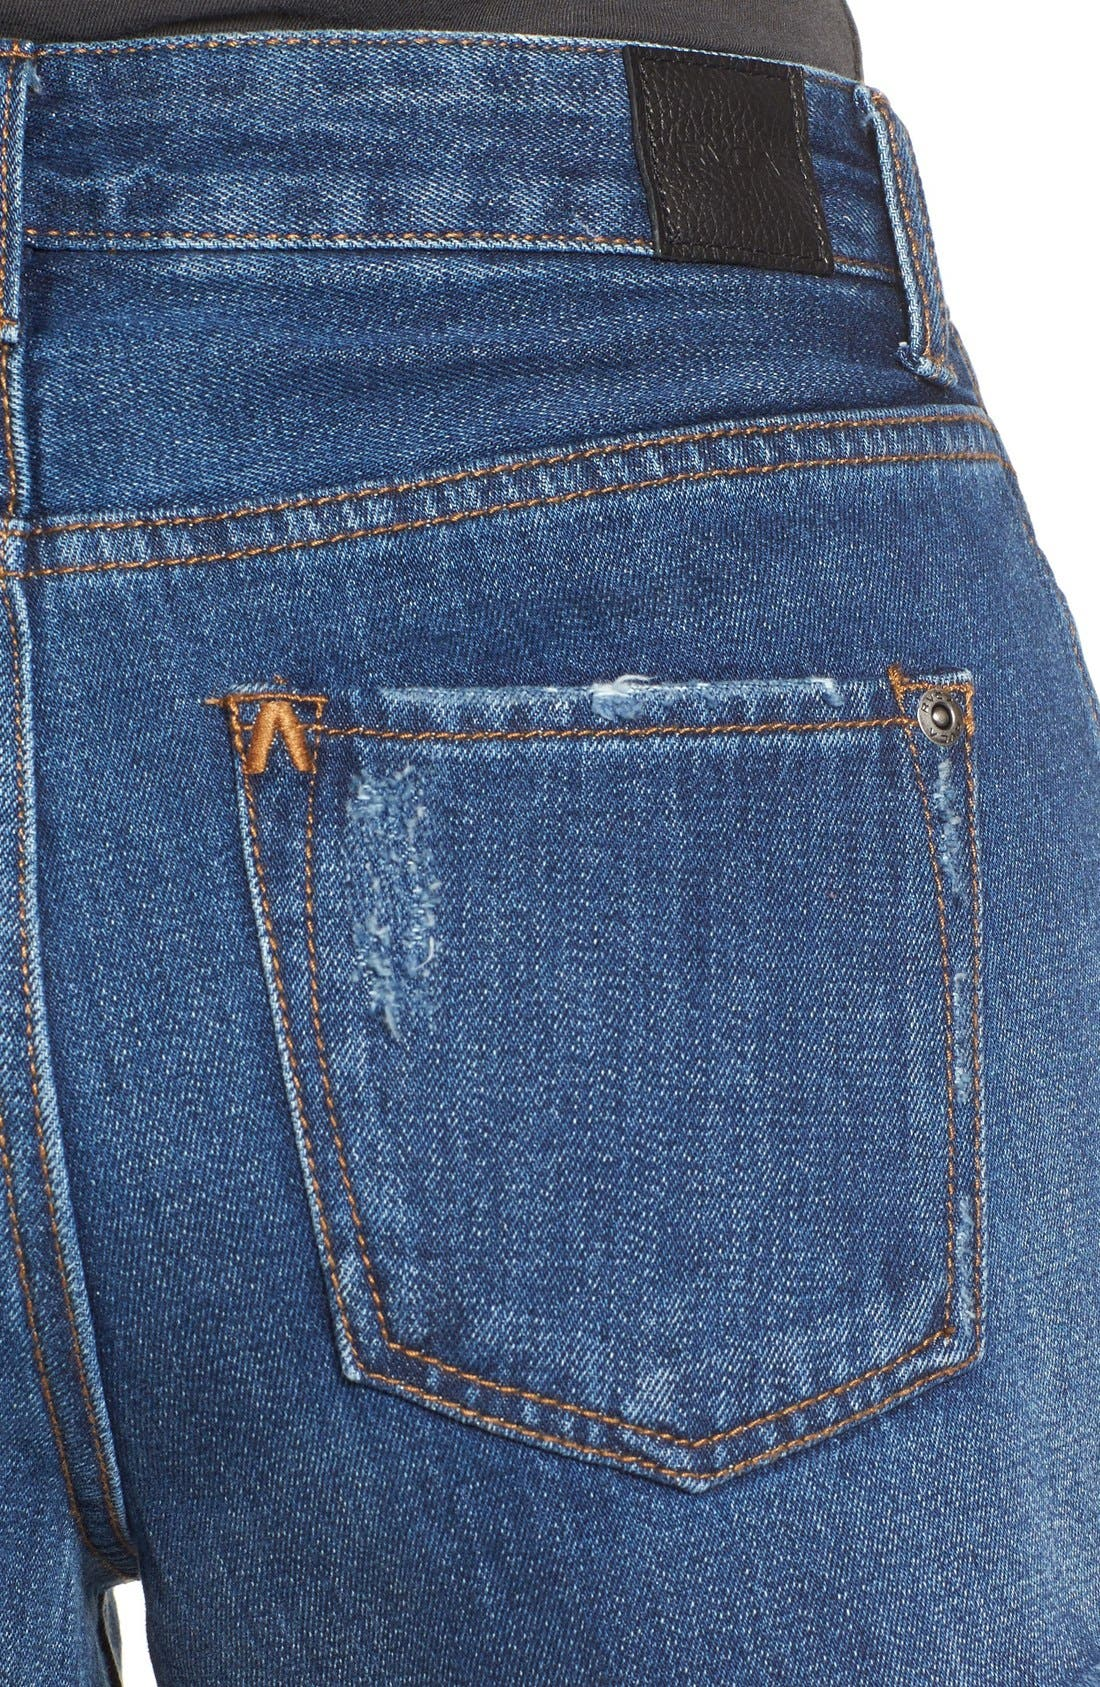 Alternate Image 4  - RVCA 'Highly Vibed' Cutoff Denim Shorts